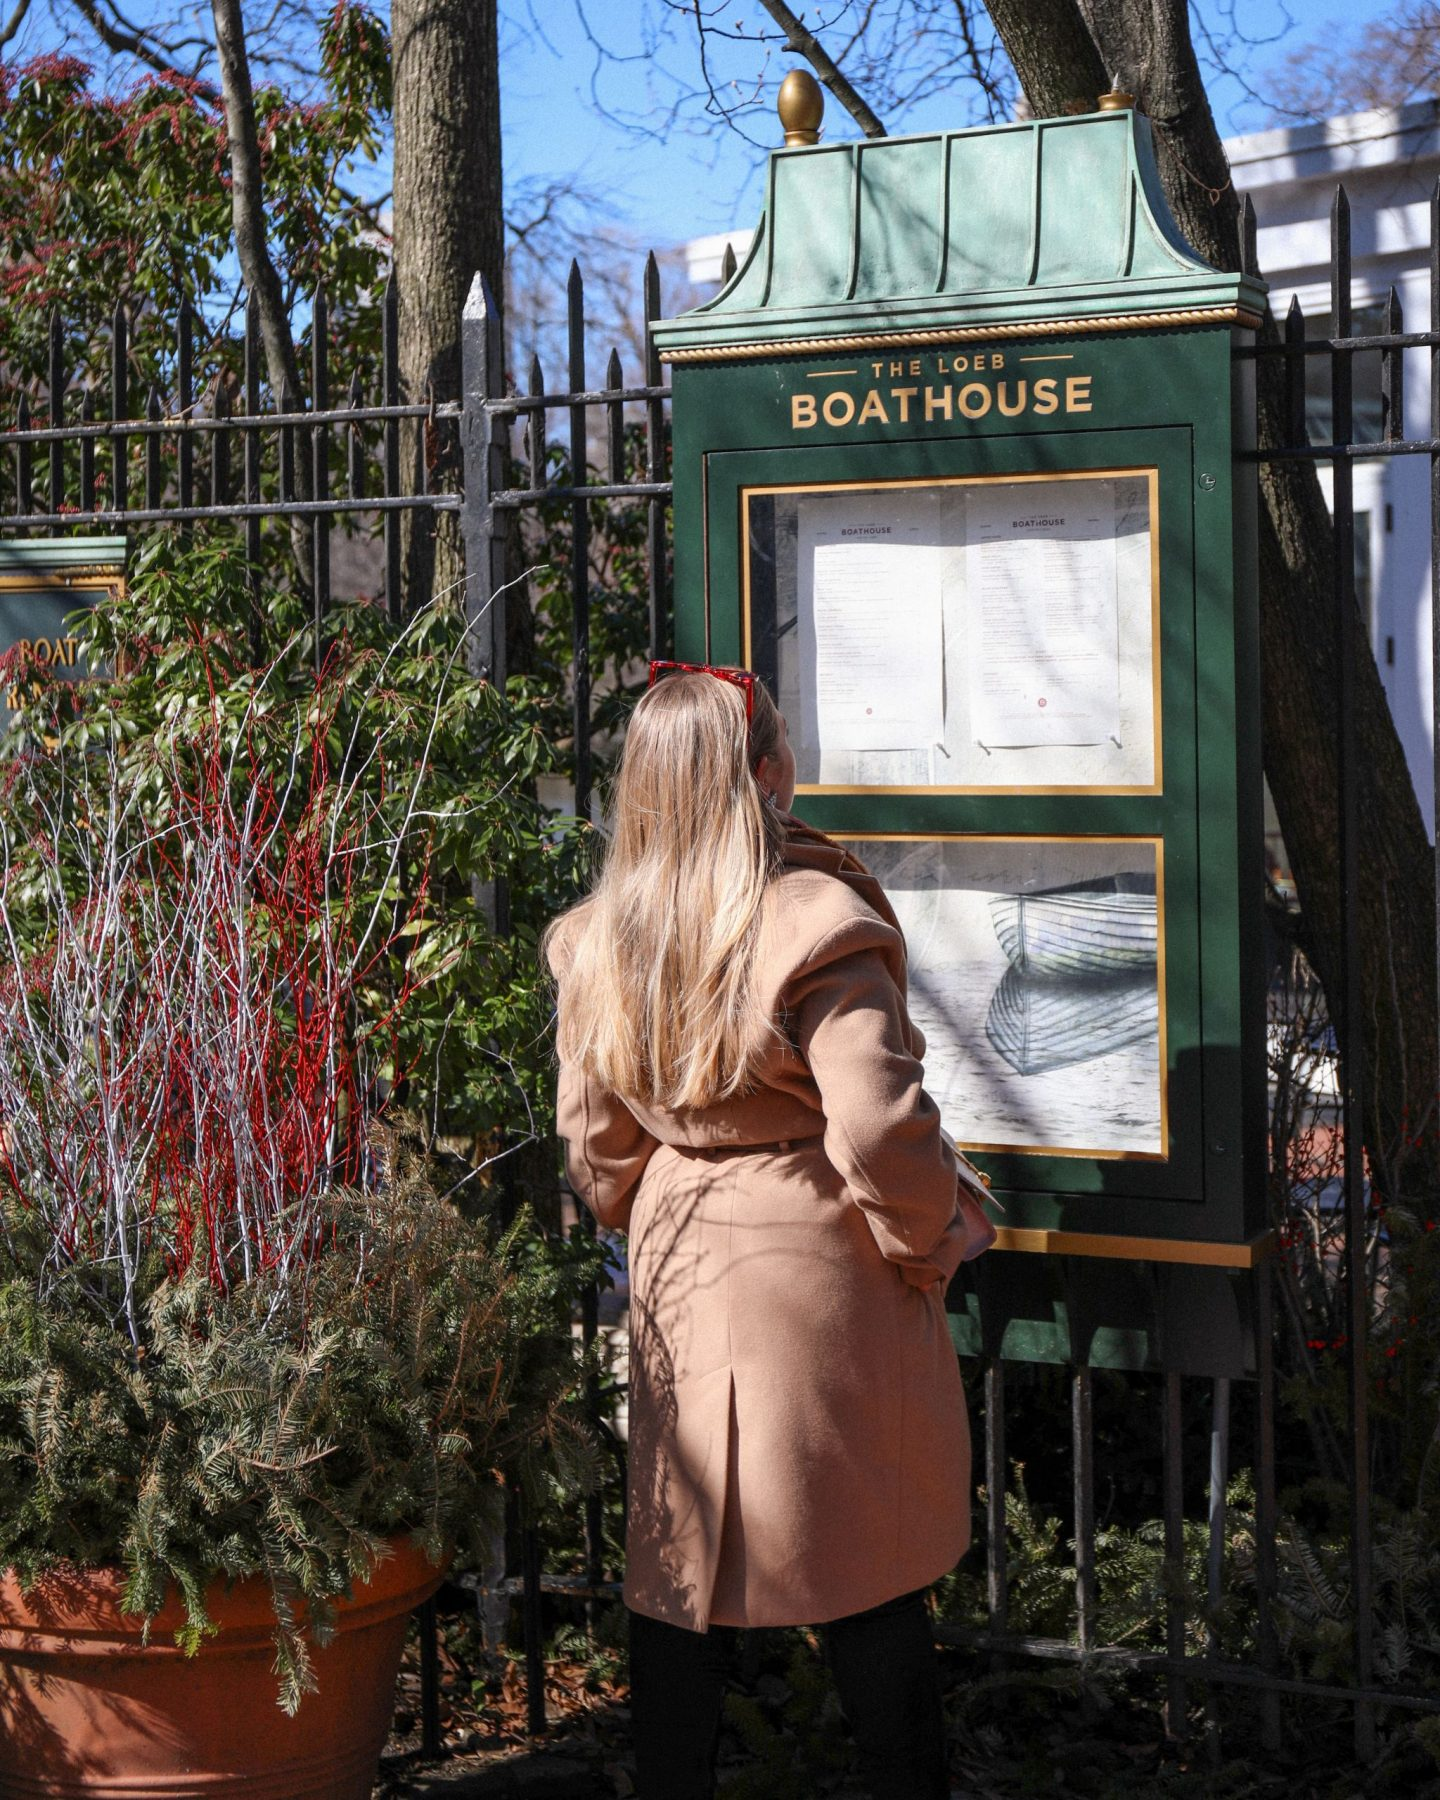 The Boat House, Central Park, New York, Katie Heath, KALANCHOE